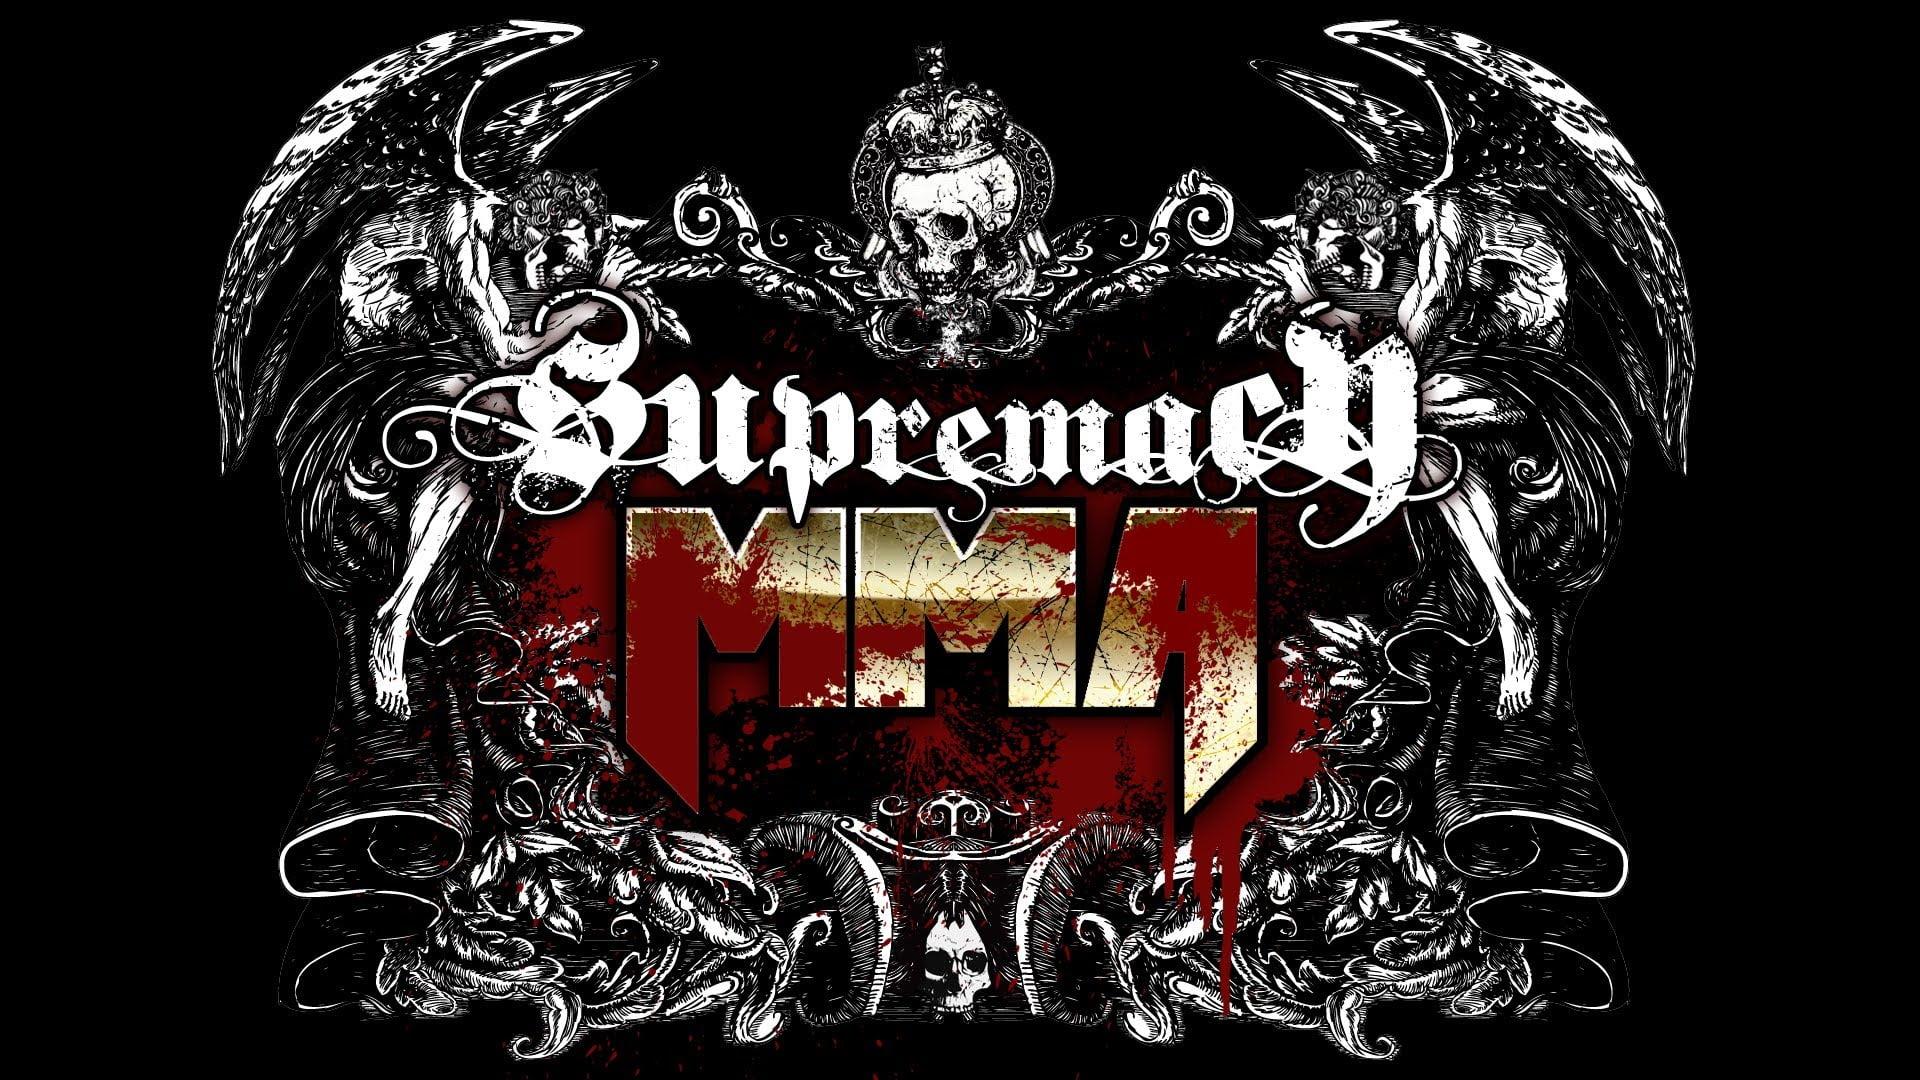 Supremacy MMA logo HD wallpaper Wallpaper Flare 1920x1080